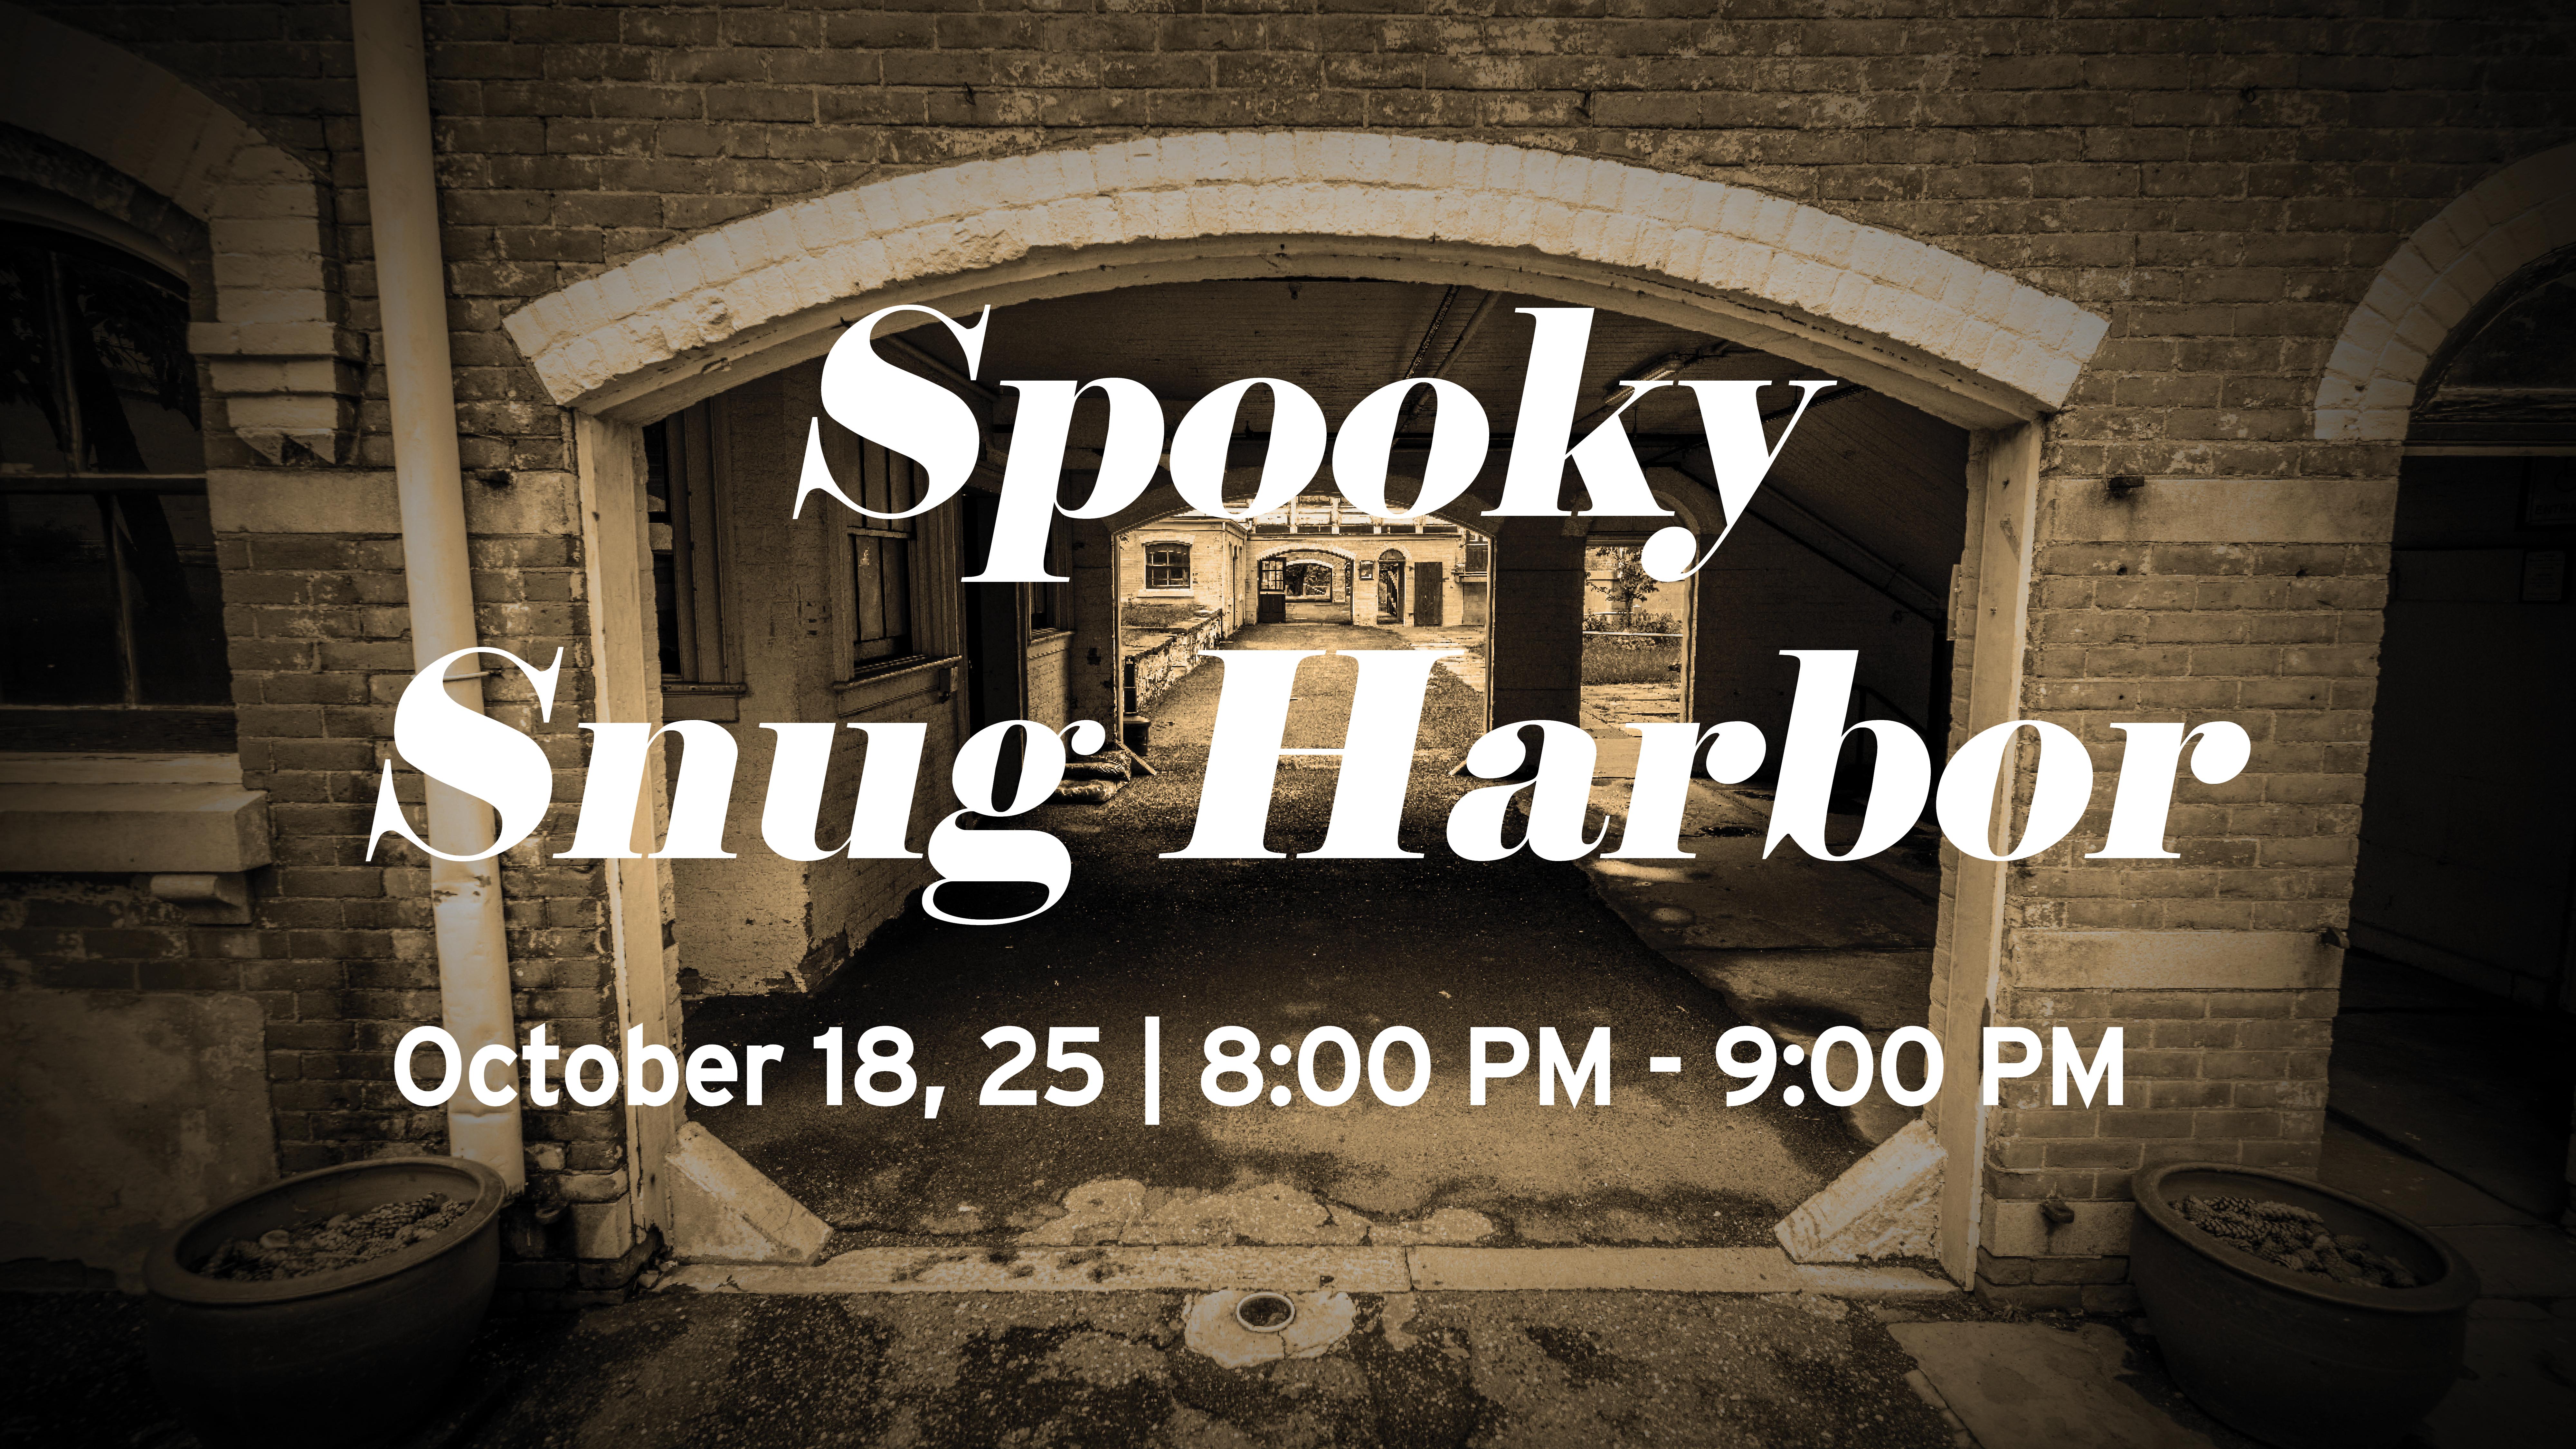 Spooky Snug Harbor Tour